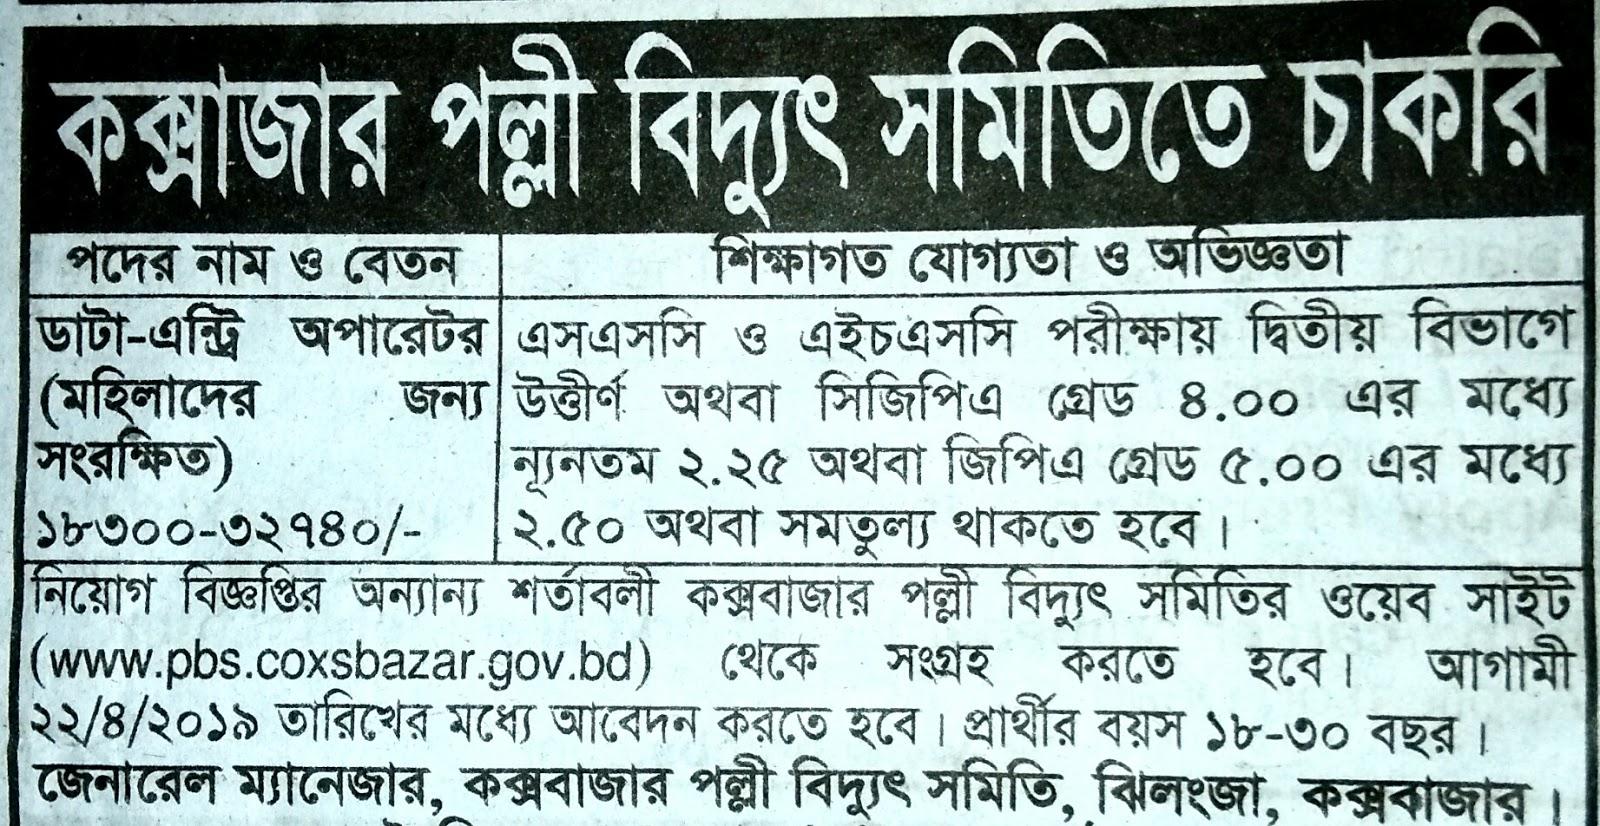 Cox's Bazar palli bidyut samity job circular 2019. কক্সবাজার পল্লী বিদ্যুৎ সমিতি নিয়োগ বিজ্ঞপ্তি ২০১৯